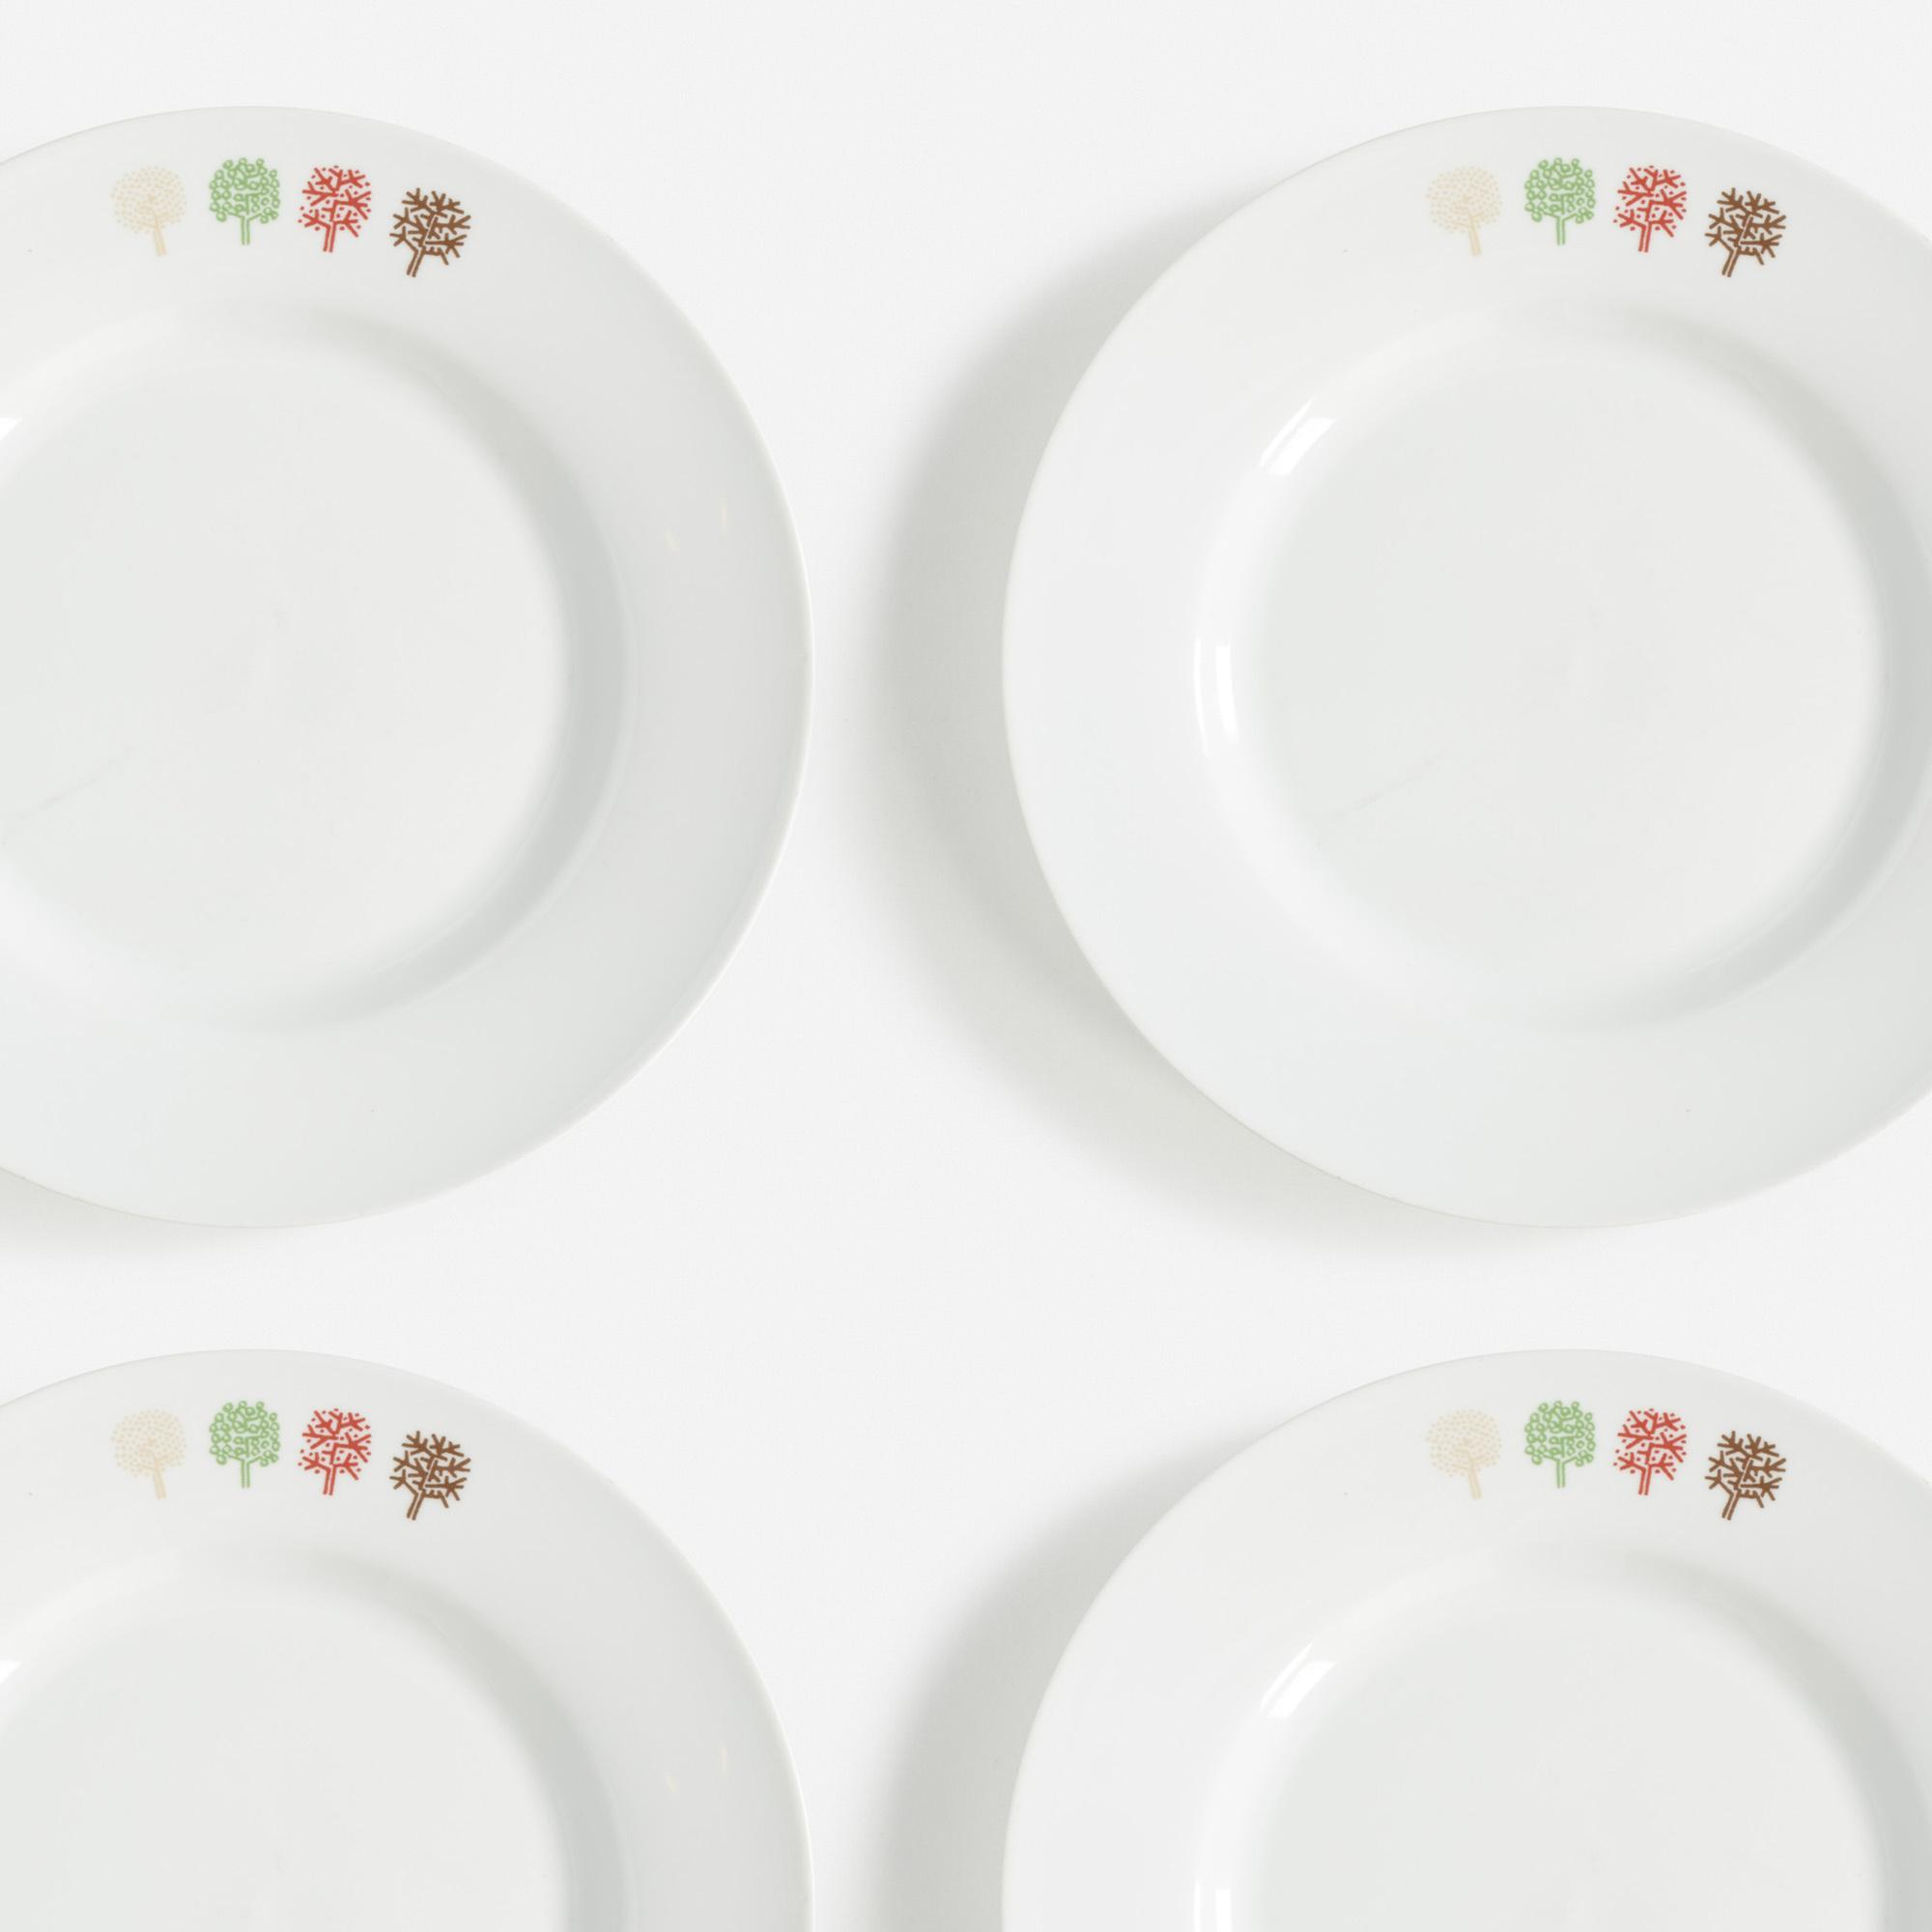 443:  / Four Seasons plates, set of twelve (1 of 1)